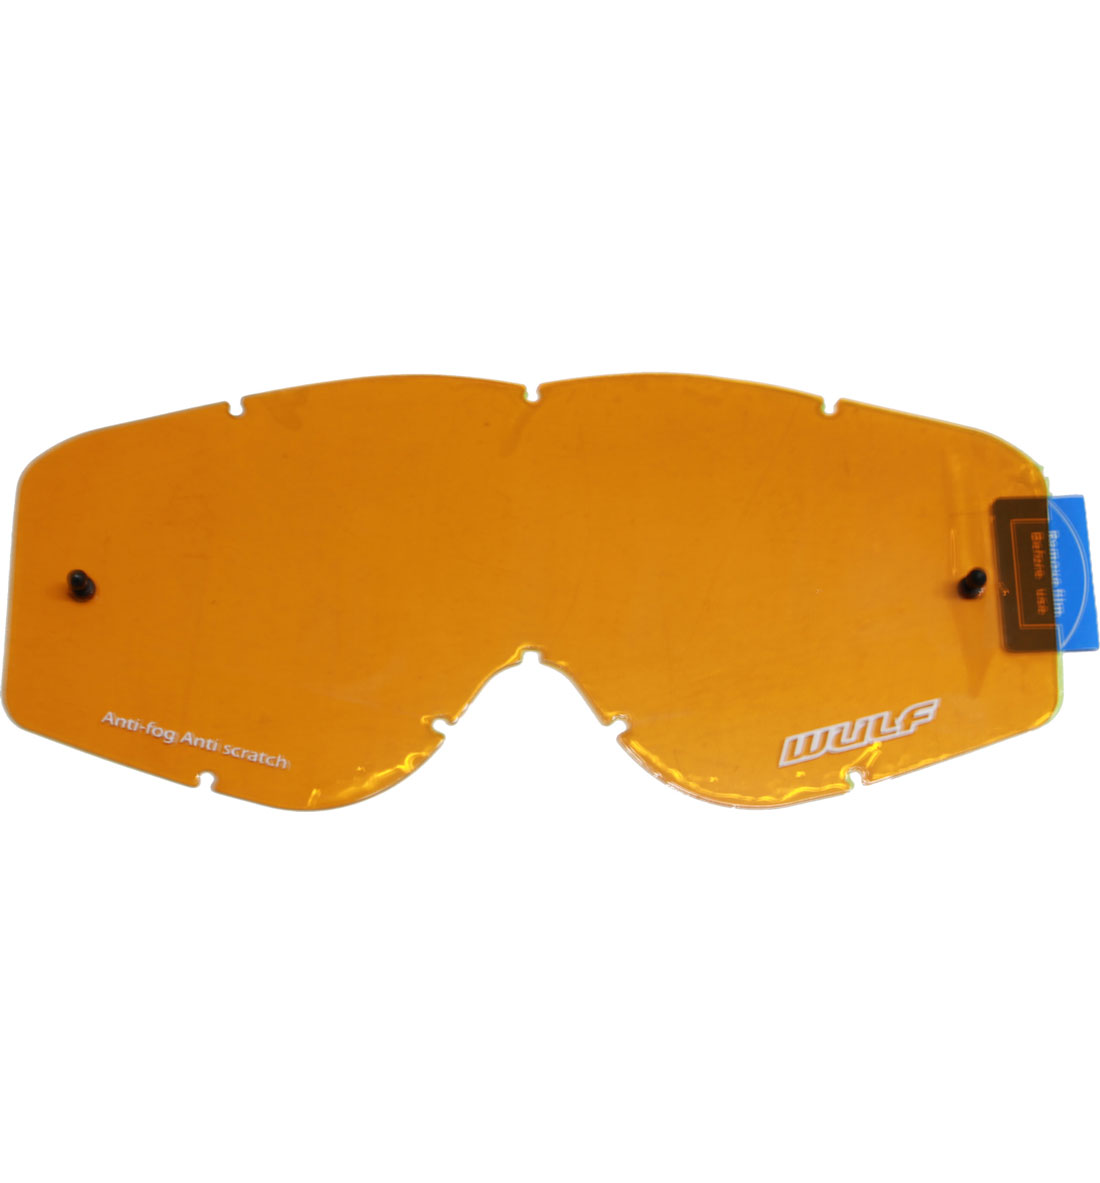 Wulfsport Shade Goggle Lens - Orange